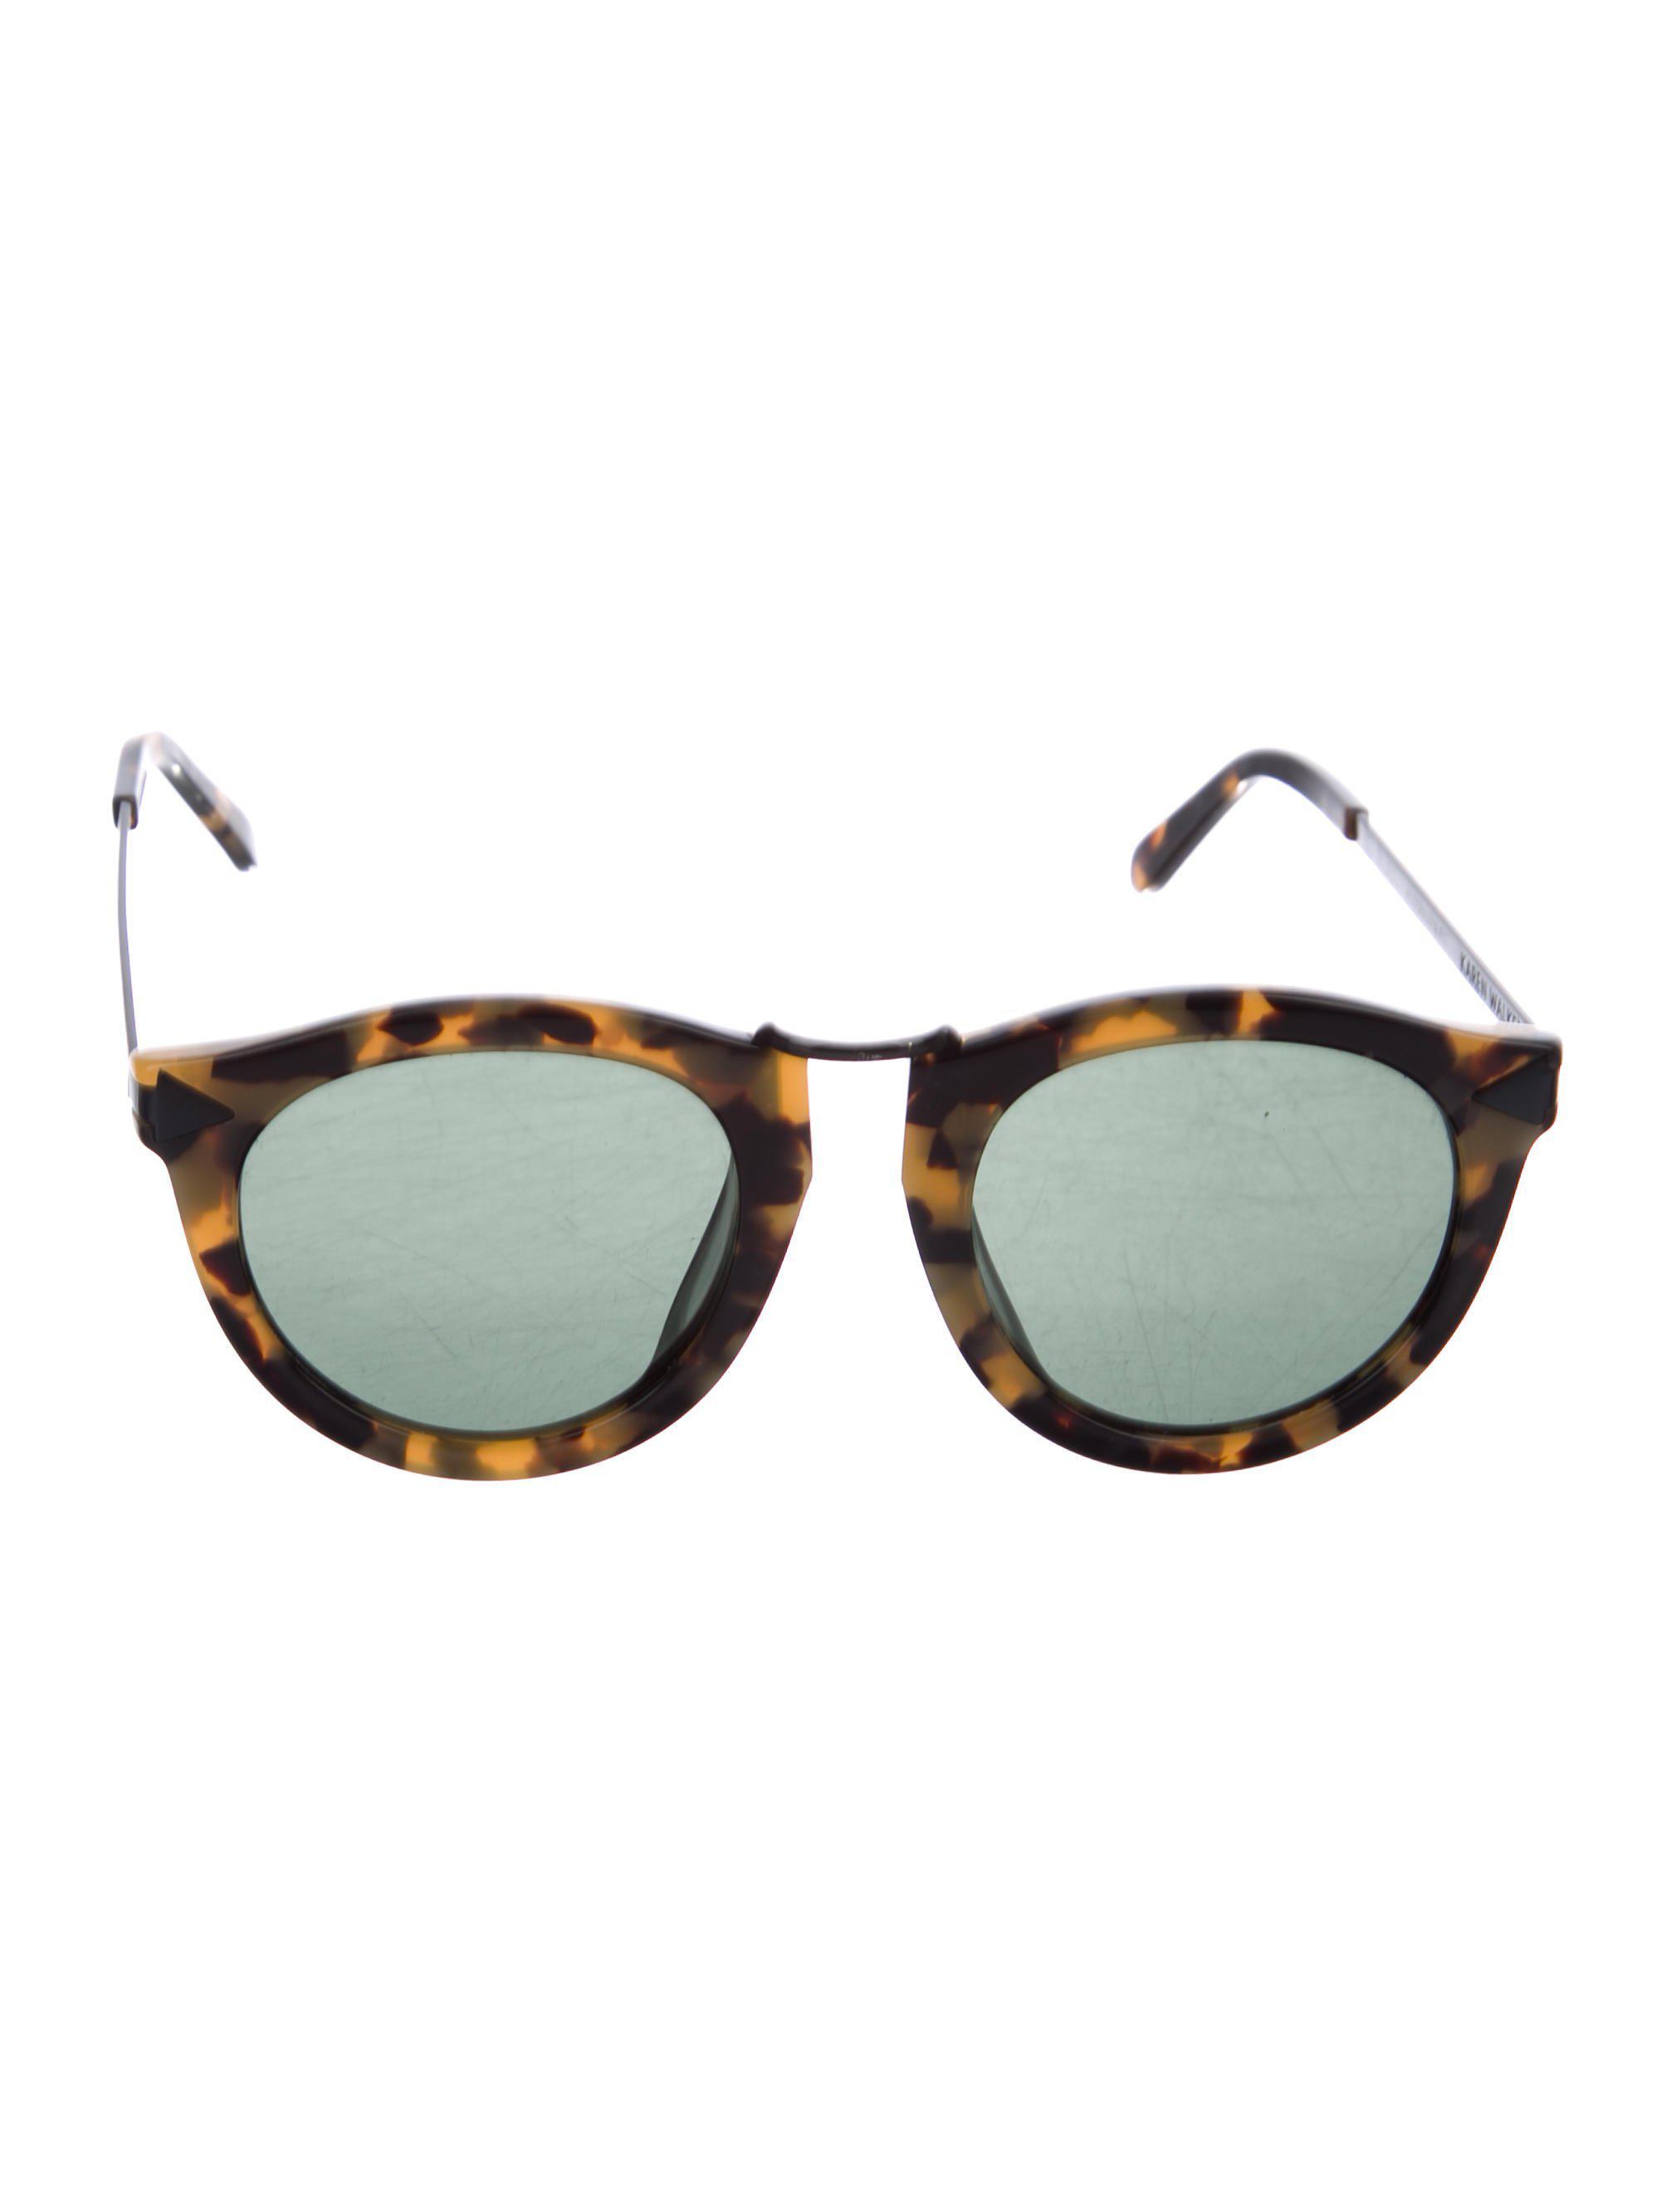 7e3ab8a0cc3b Lyst - Karen Walker Harvest Tinted Sunglasses in Brown